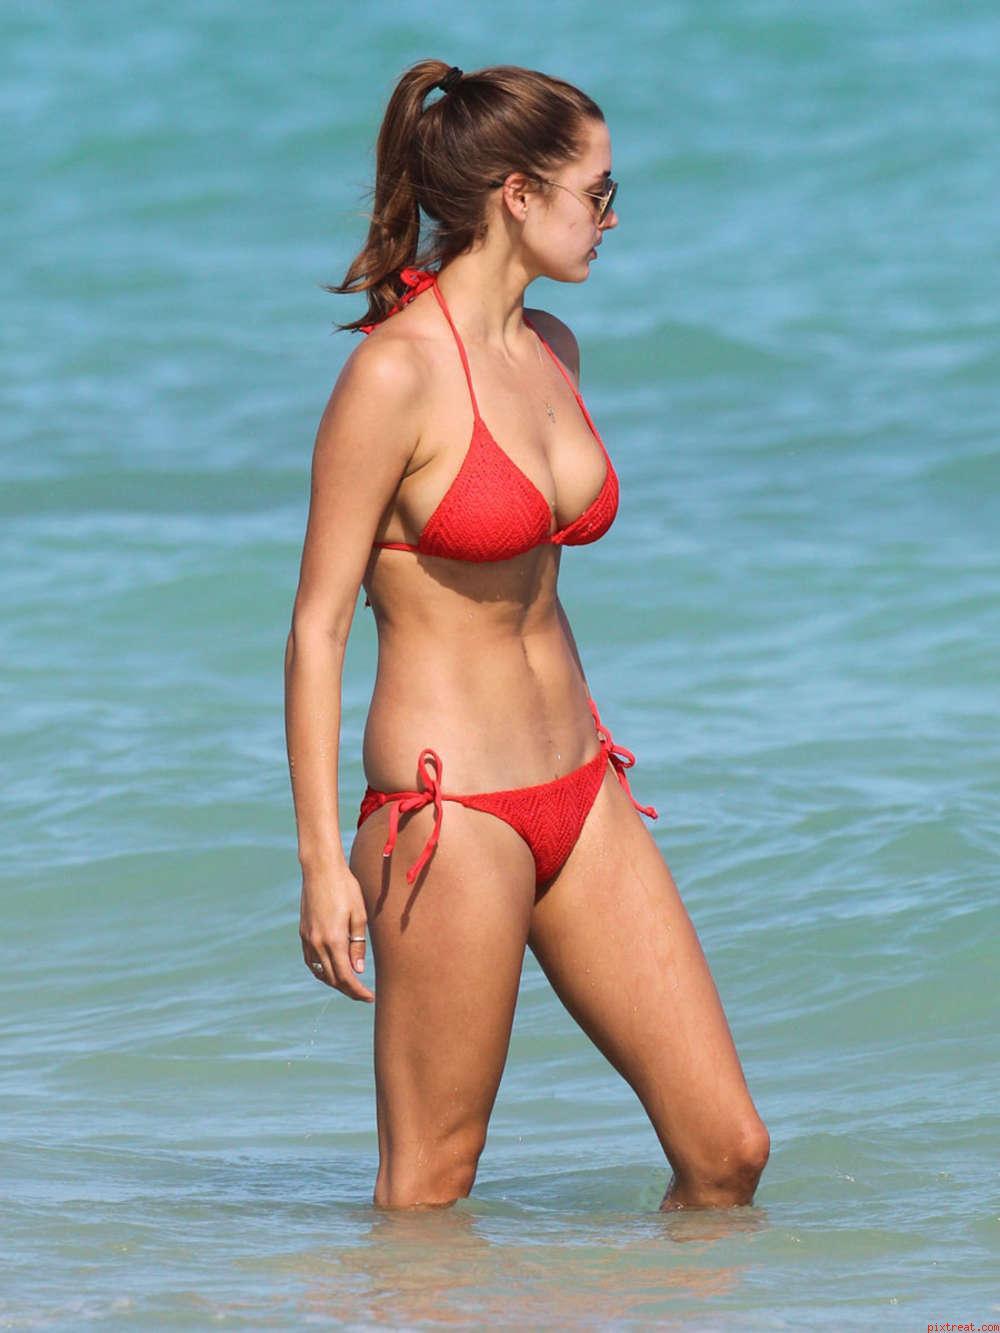 Alysa lanes bikini pictures